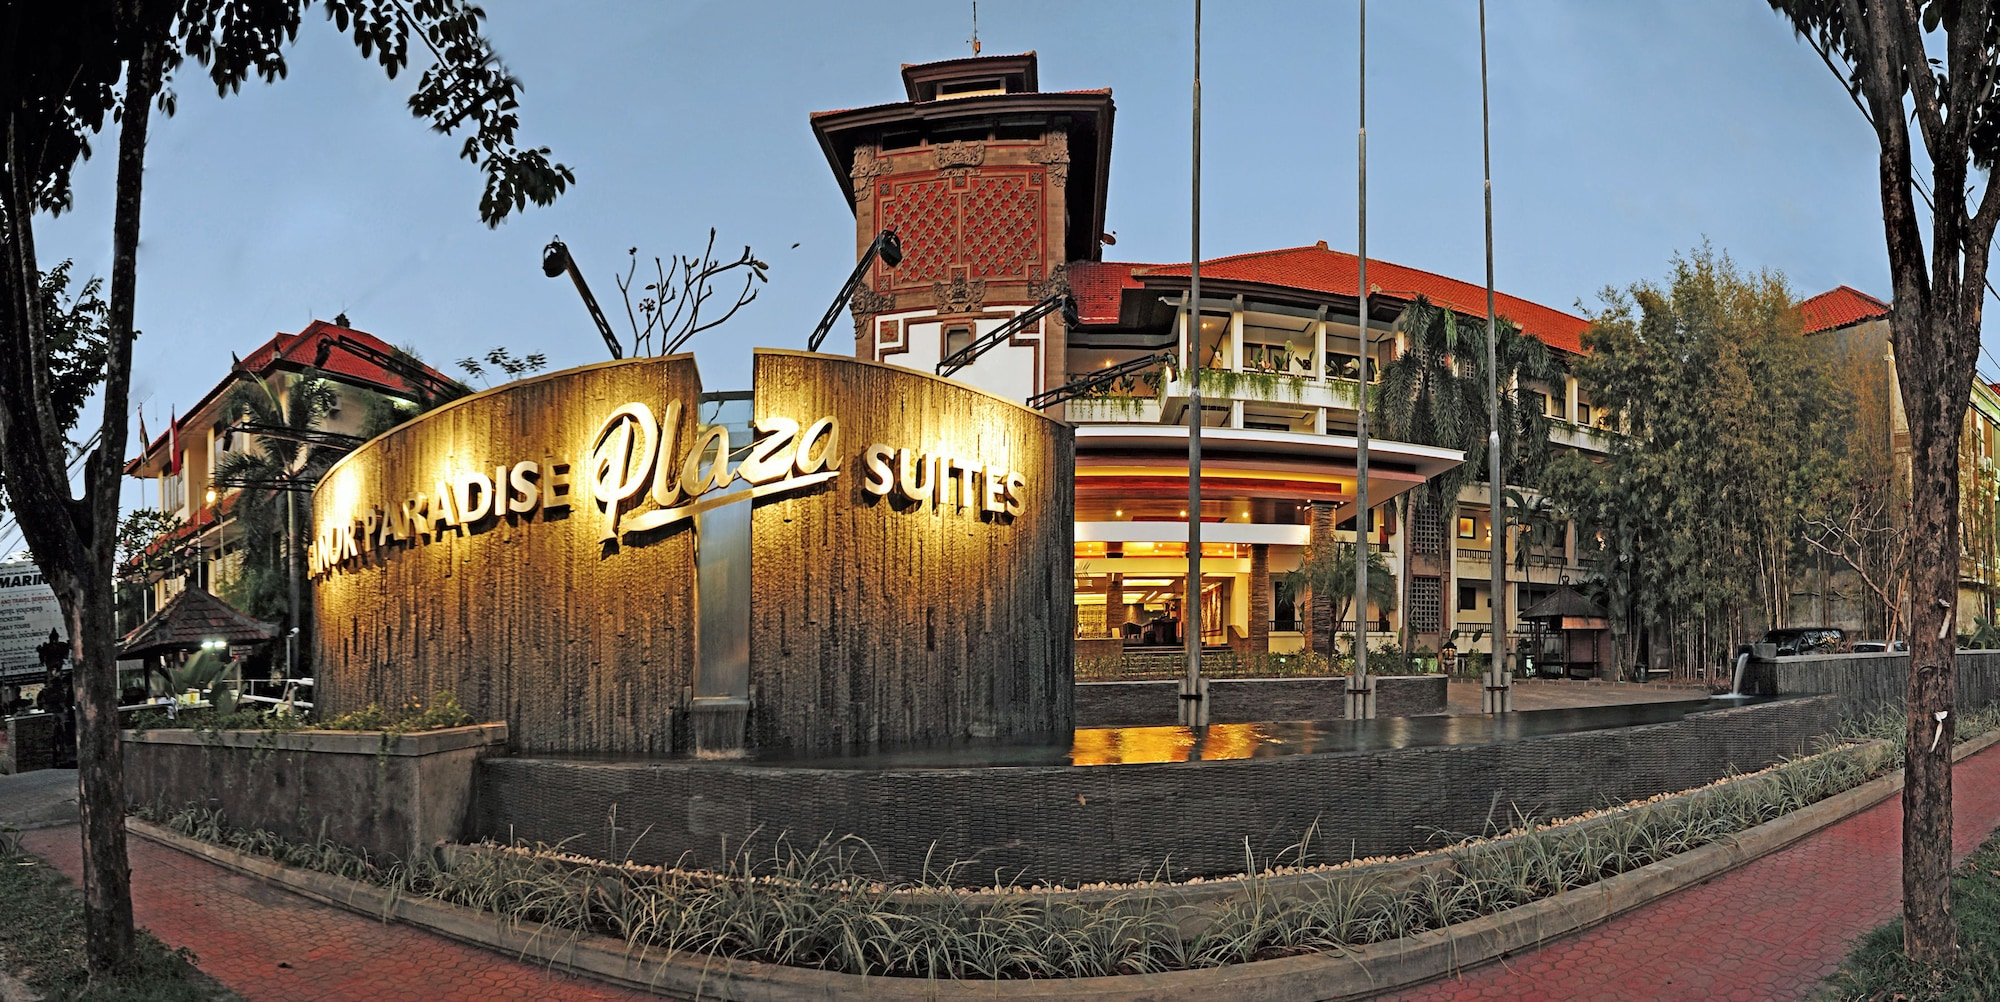 Prime Plaza Suites Sanur - Bali, Denpasar